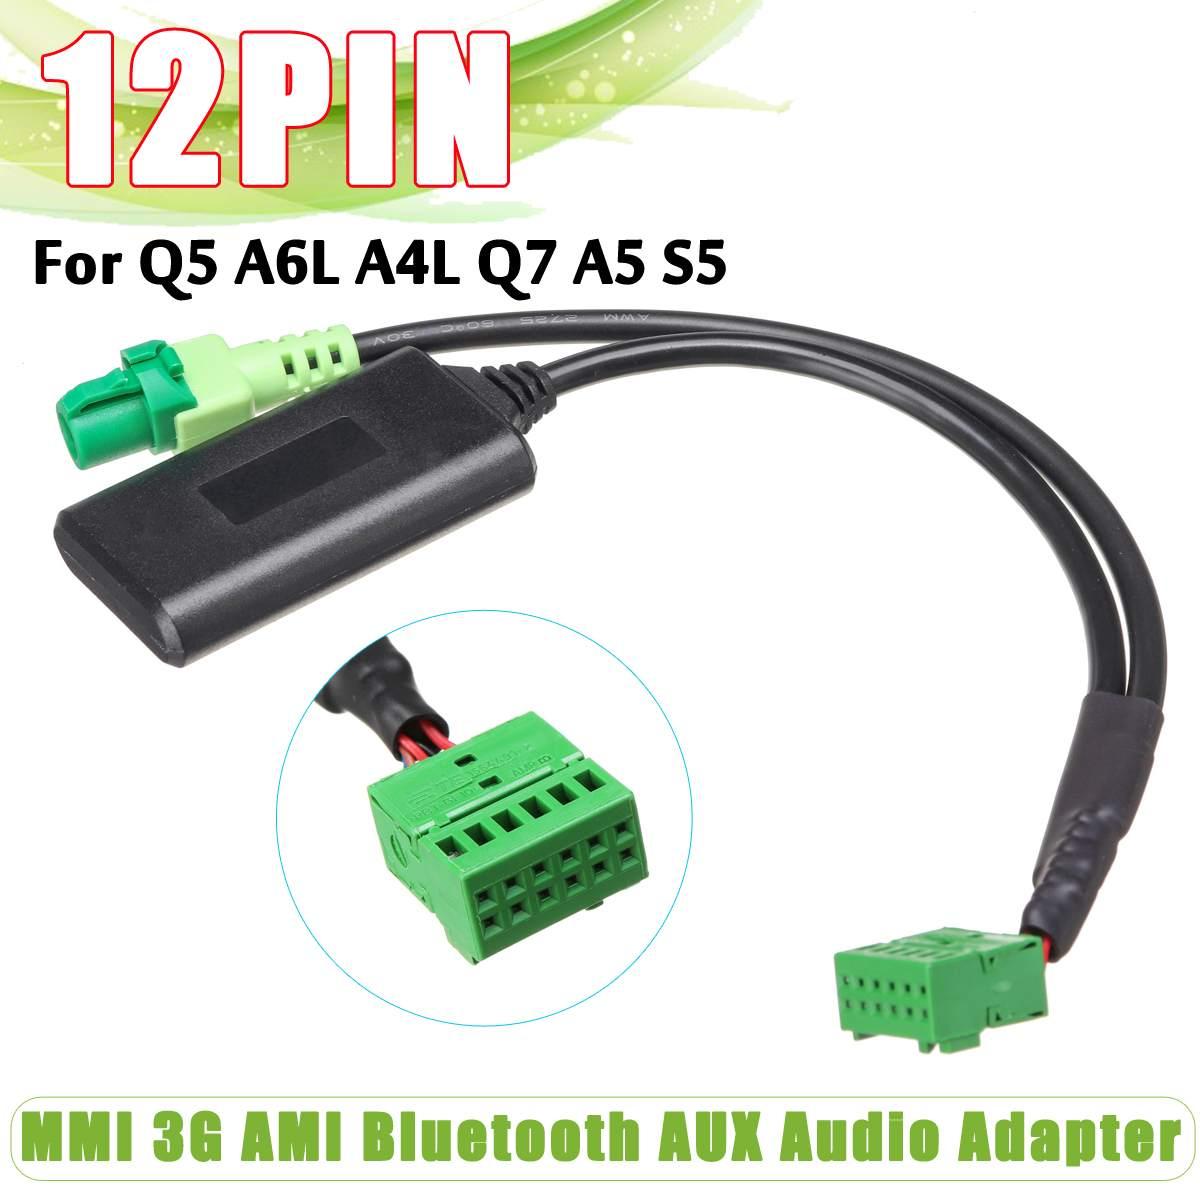 auto mmi 3g ami drahtlose bluetooth aux audio adapter kabel mmi